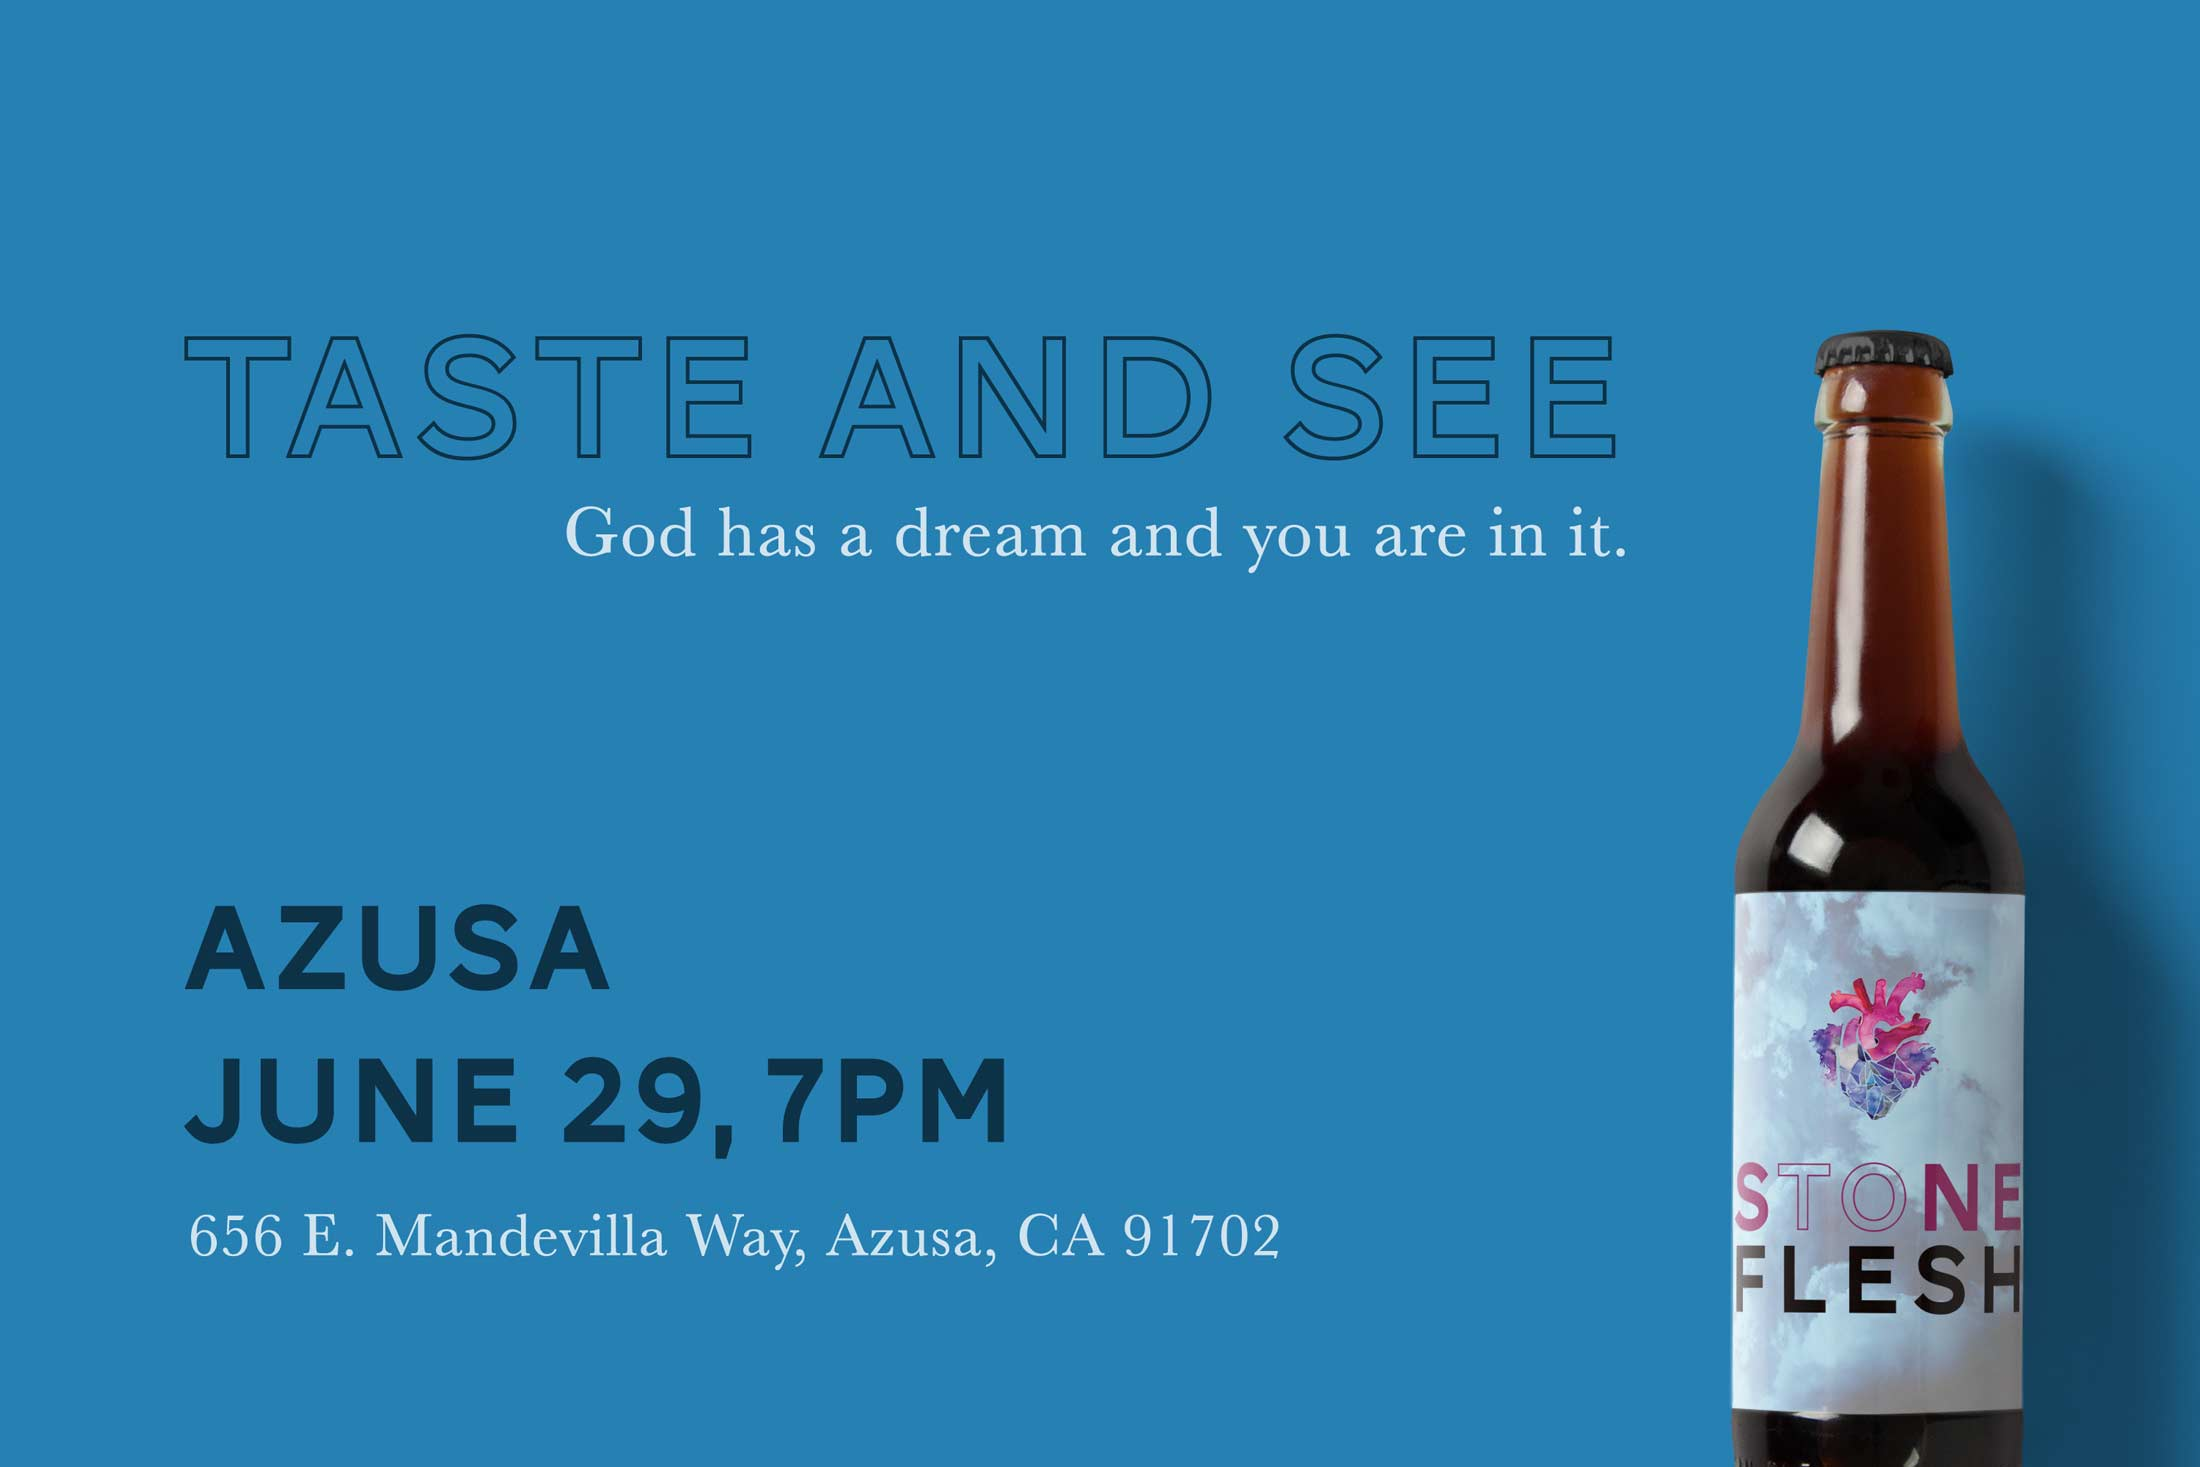 Taste-and-see-Azusa-front.jpg